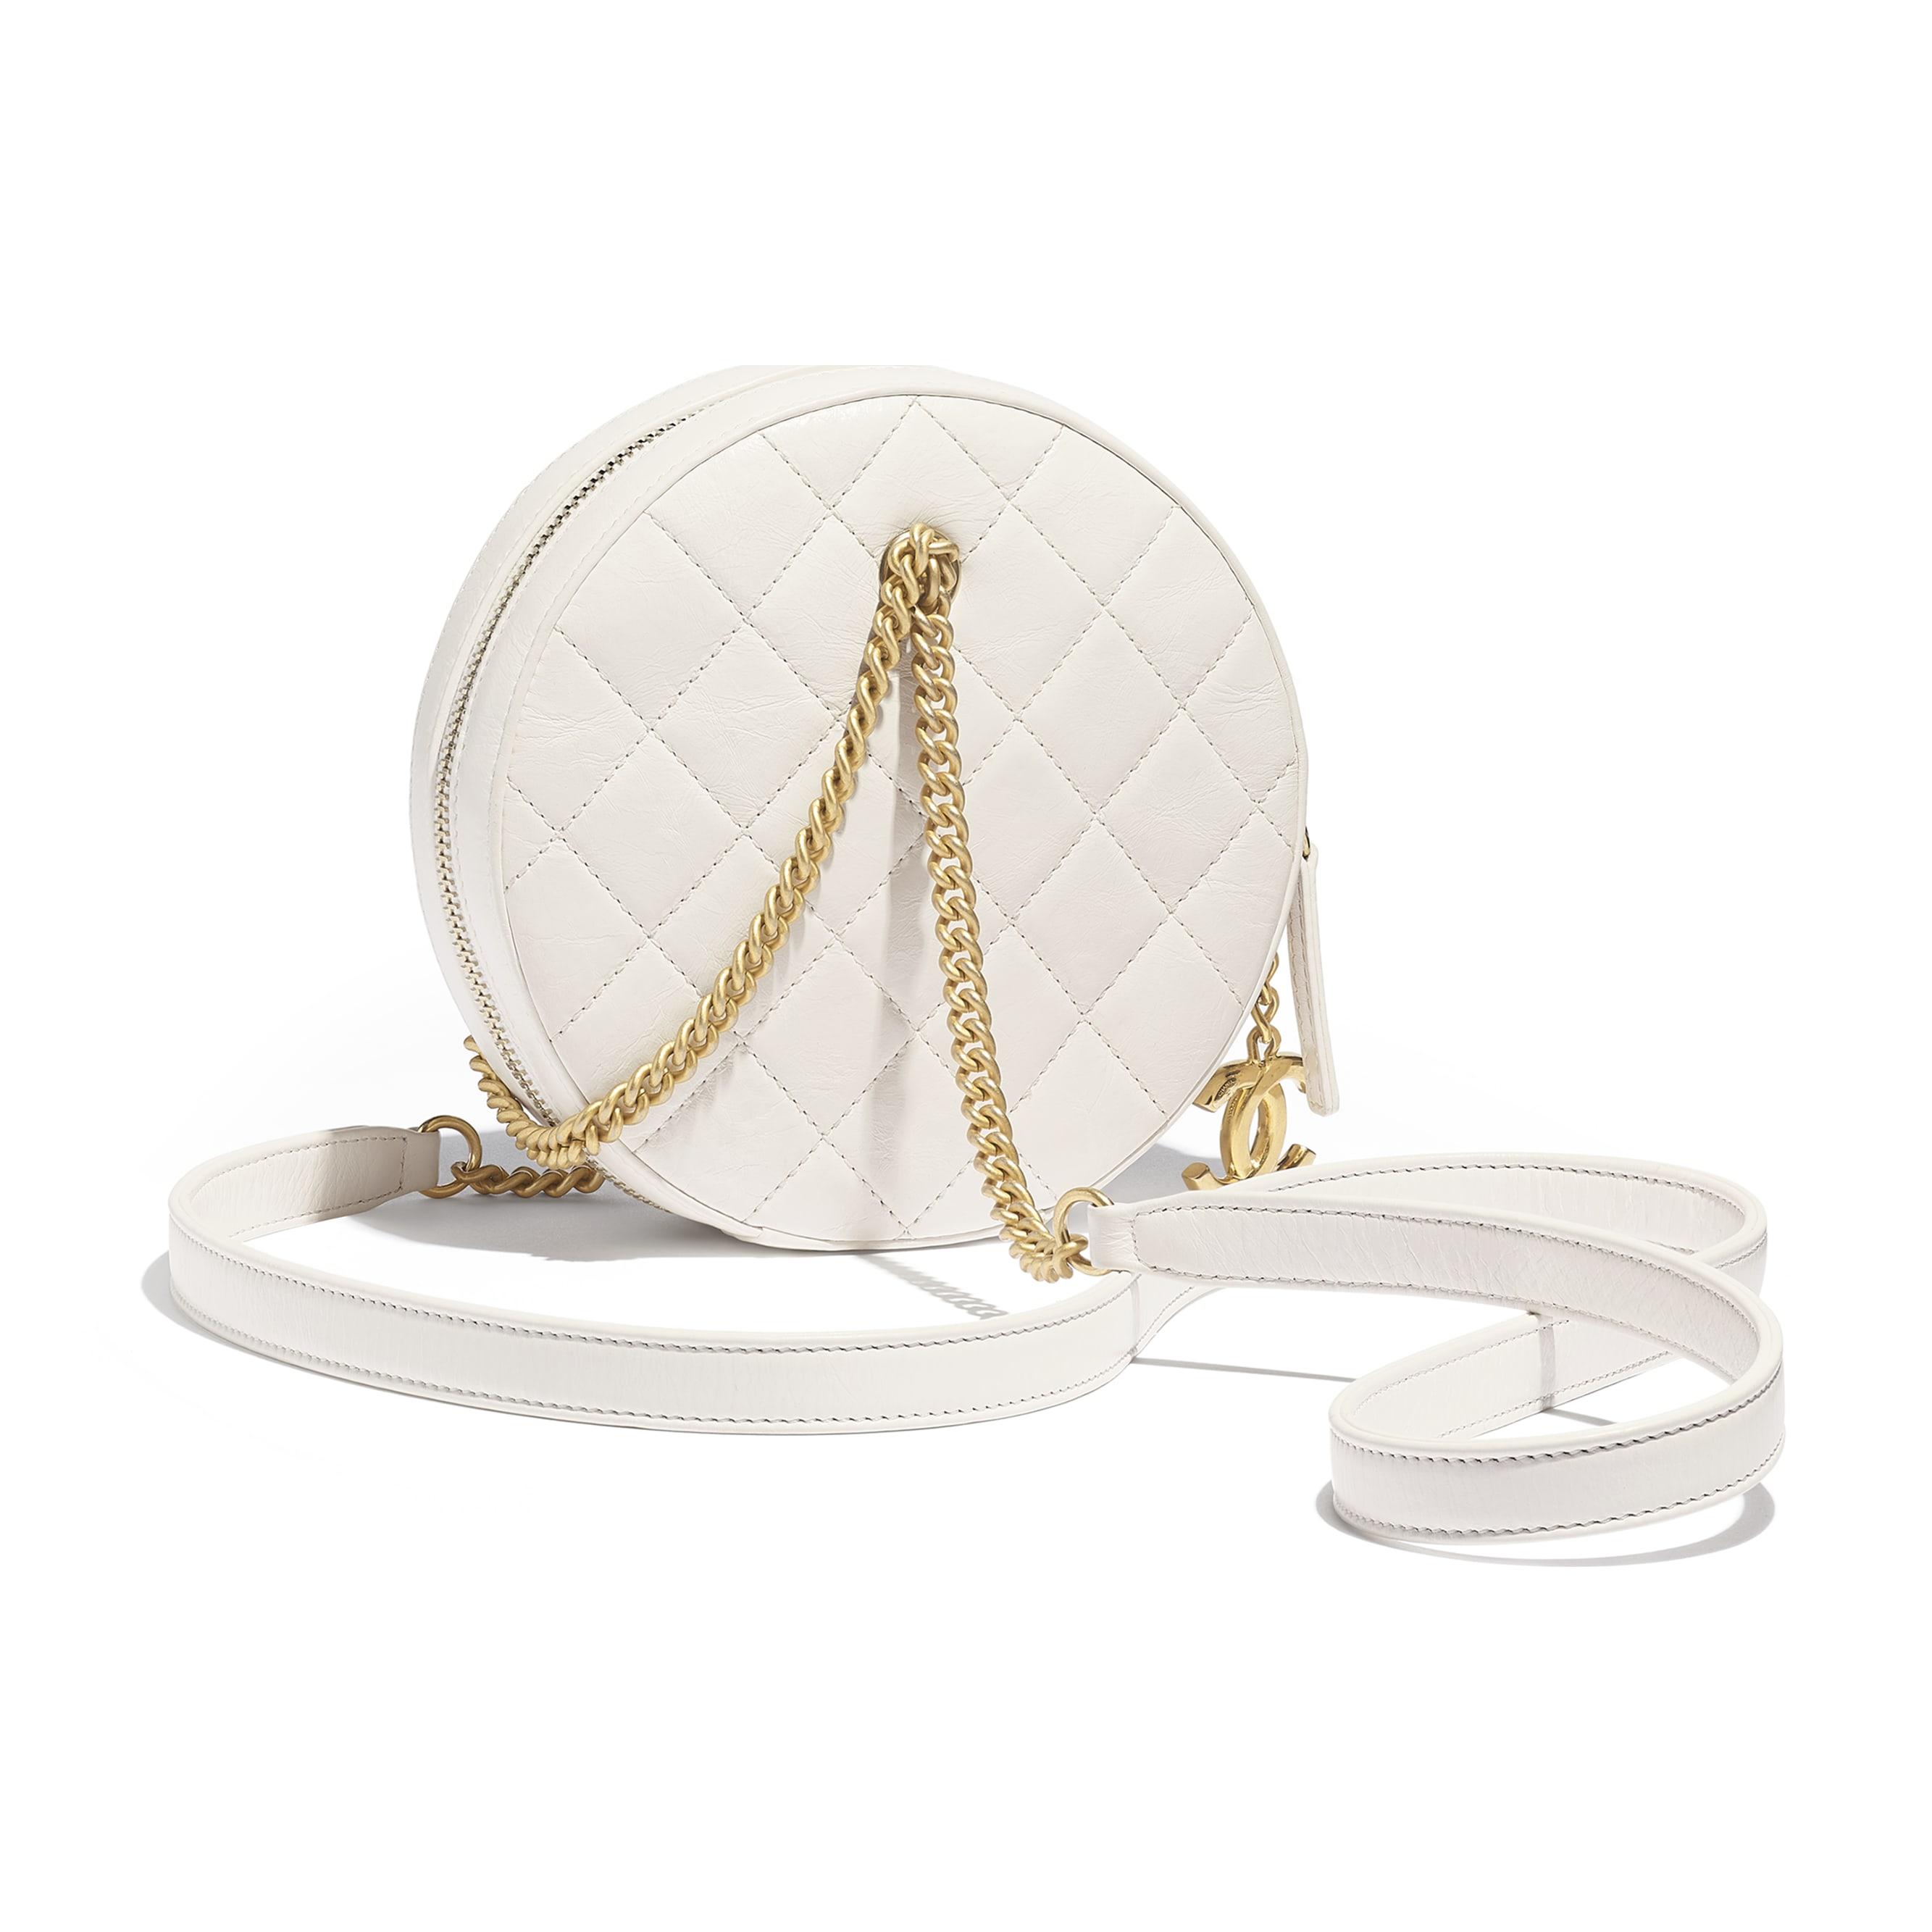 baf1055dd399 ... Small Round Bag - White - Crumpled Calfskin